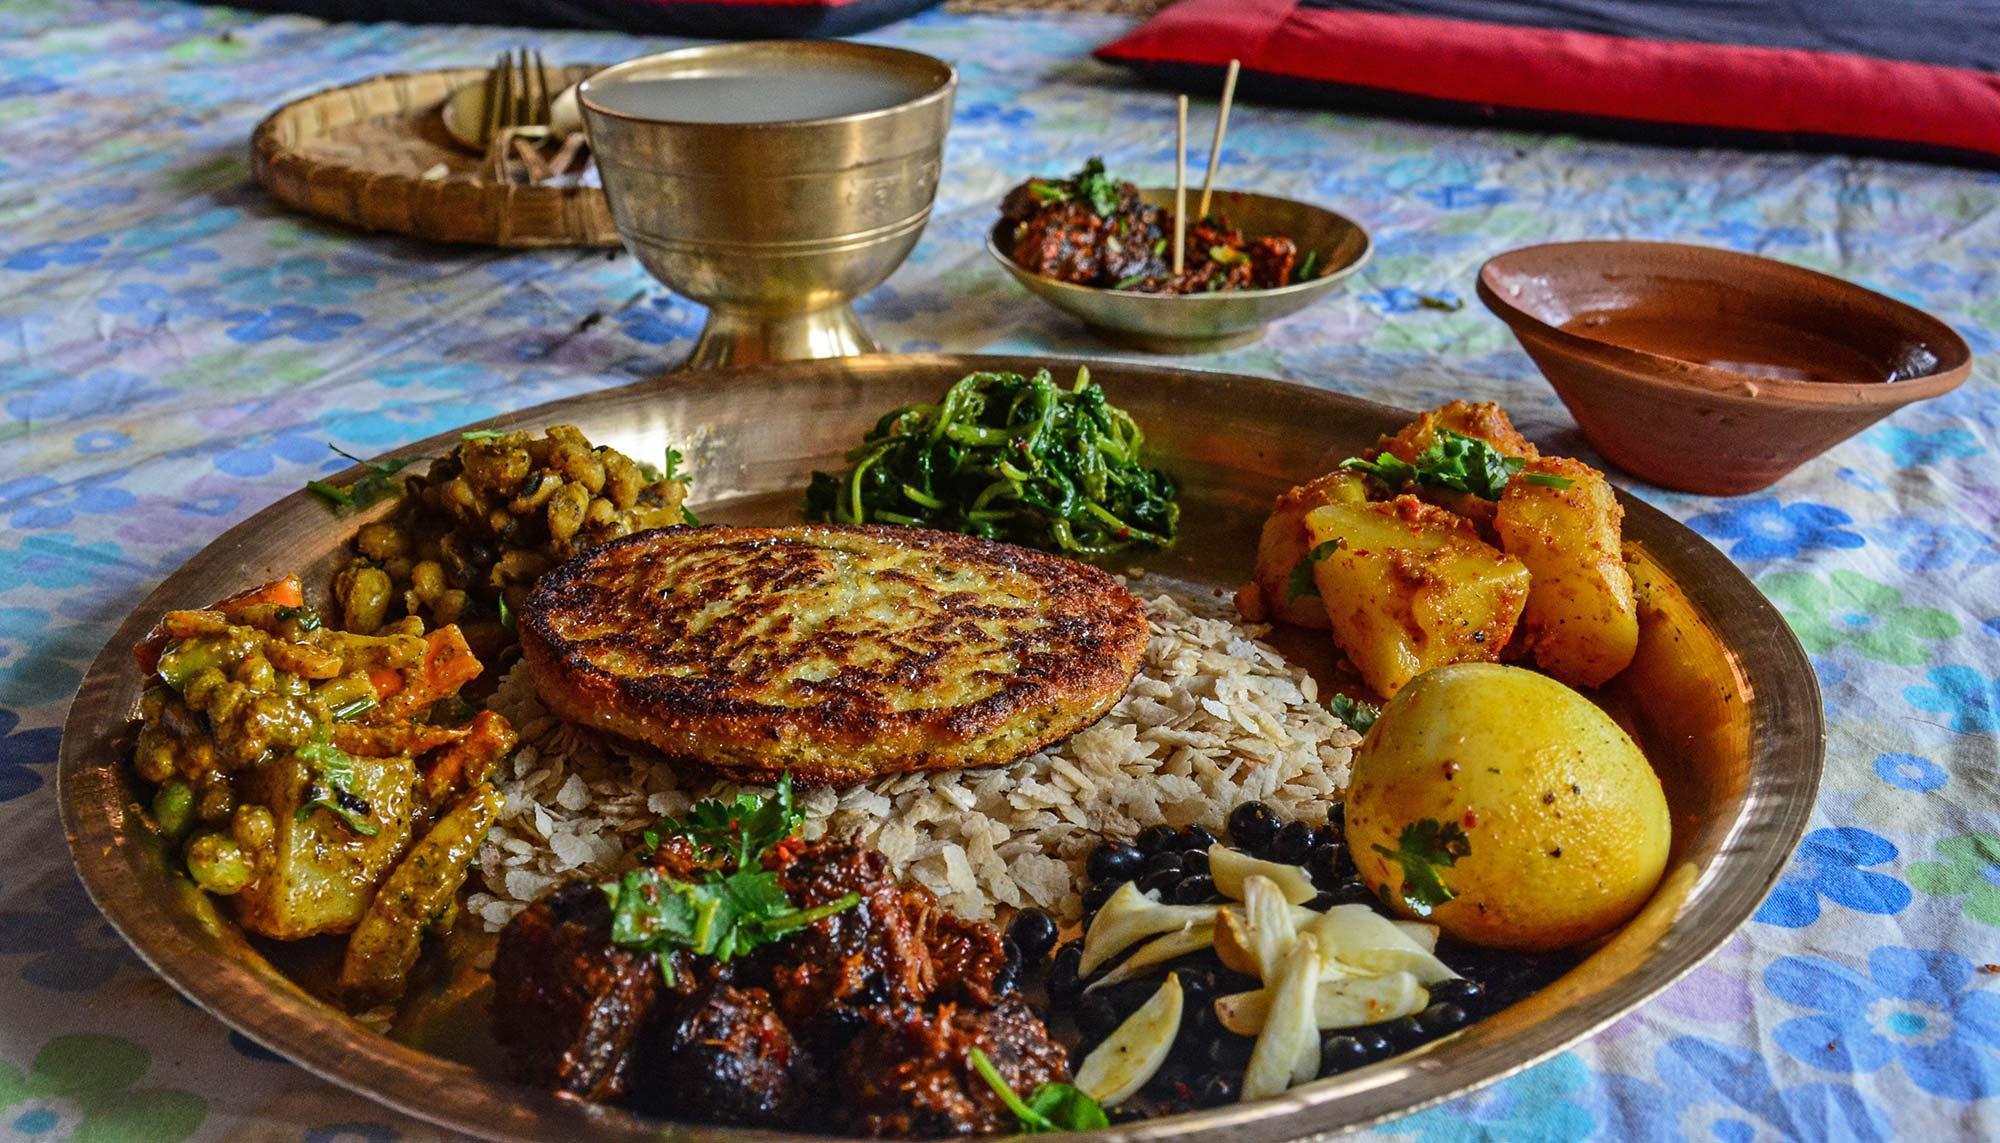 must try newari food when in nepal